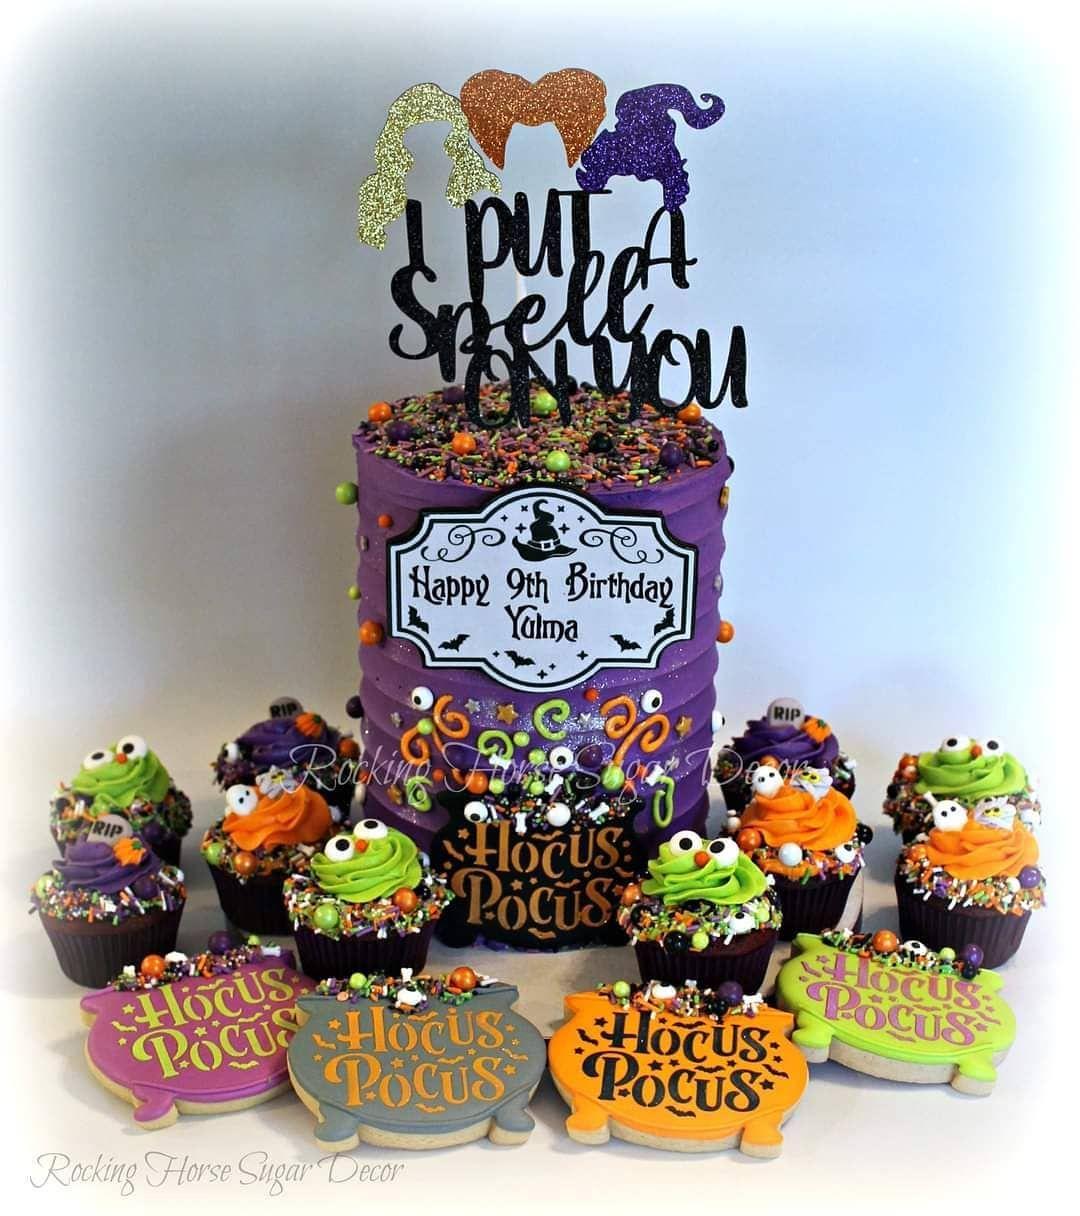 "rocking horse sugar decor on Instagram: ""Hocus Pocus Birthday #rockinghorsesugardecor #edibleart #customdecoratedcookies #decoratedsugarcookies #hocuspocuscookies #hocuspocuscake…"""